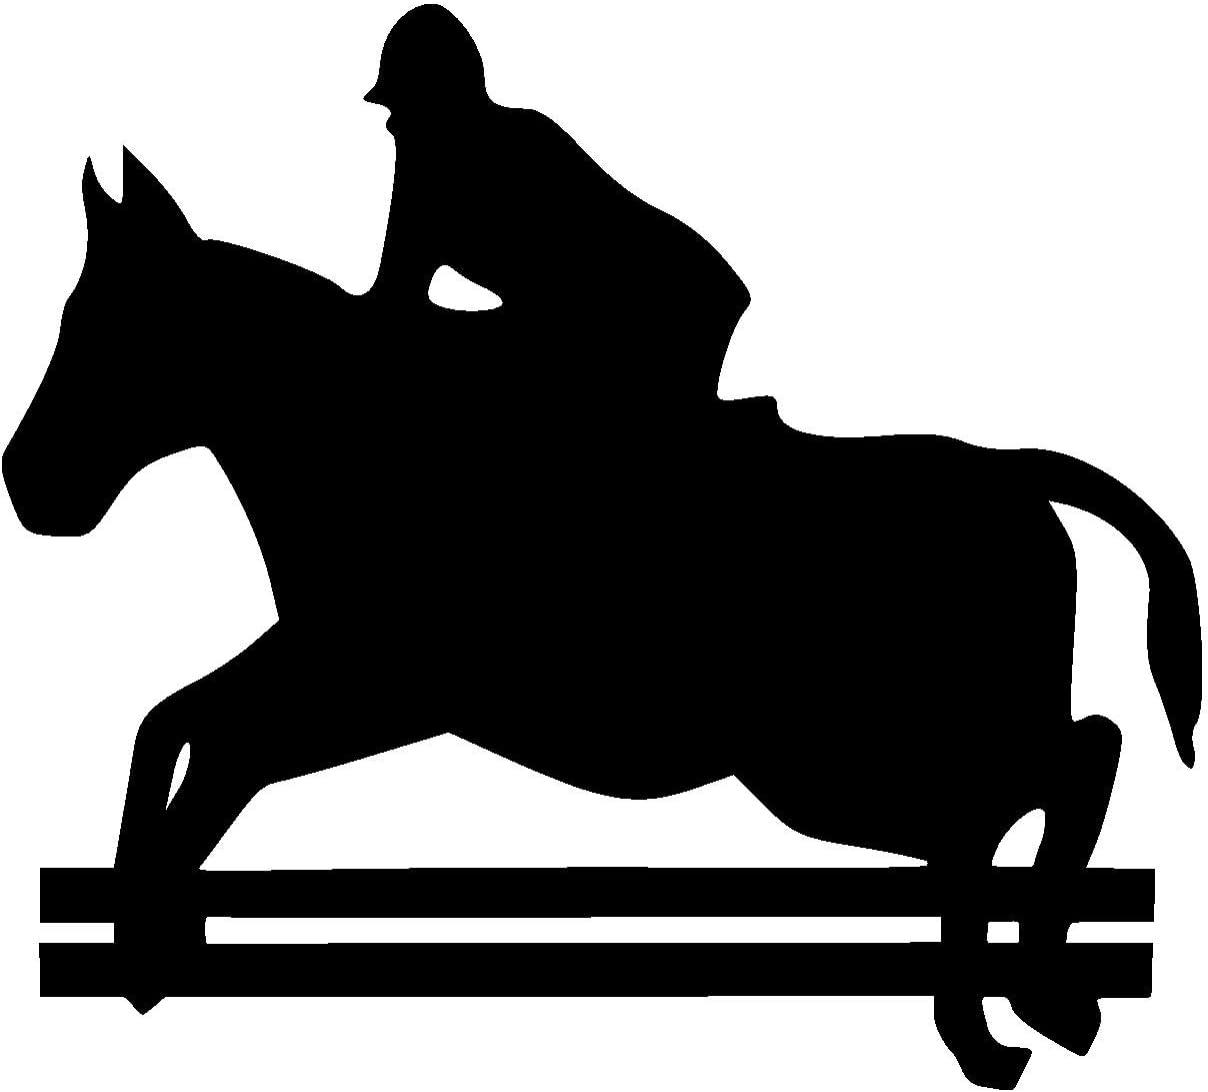 Horse Sticker Sport Scene Horse Riding The Black 070 30 X 27cm Amazon Co Uk Kitchen Home